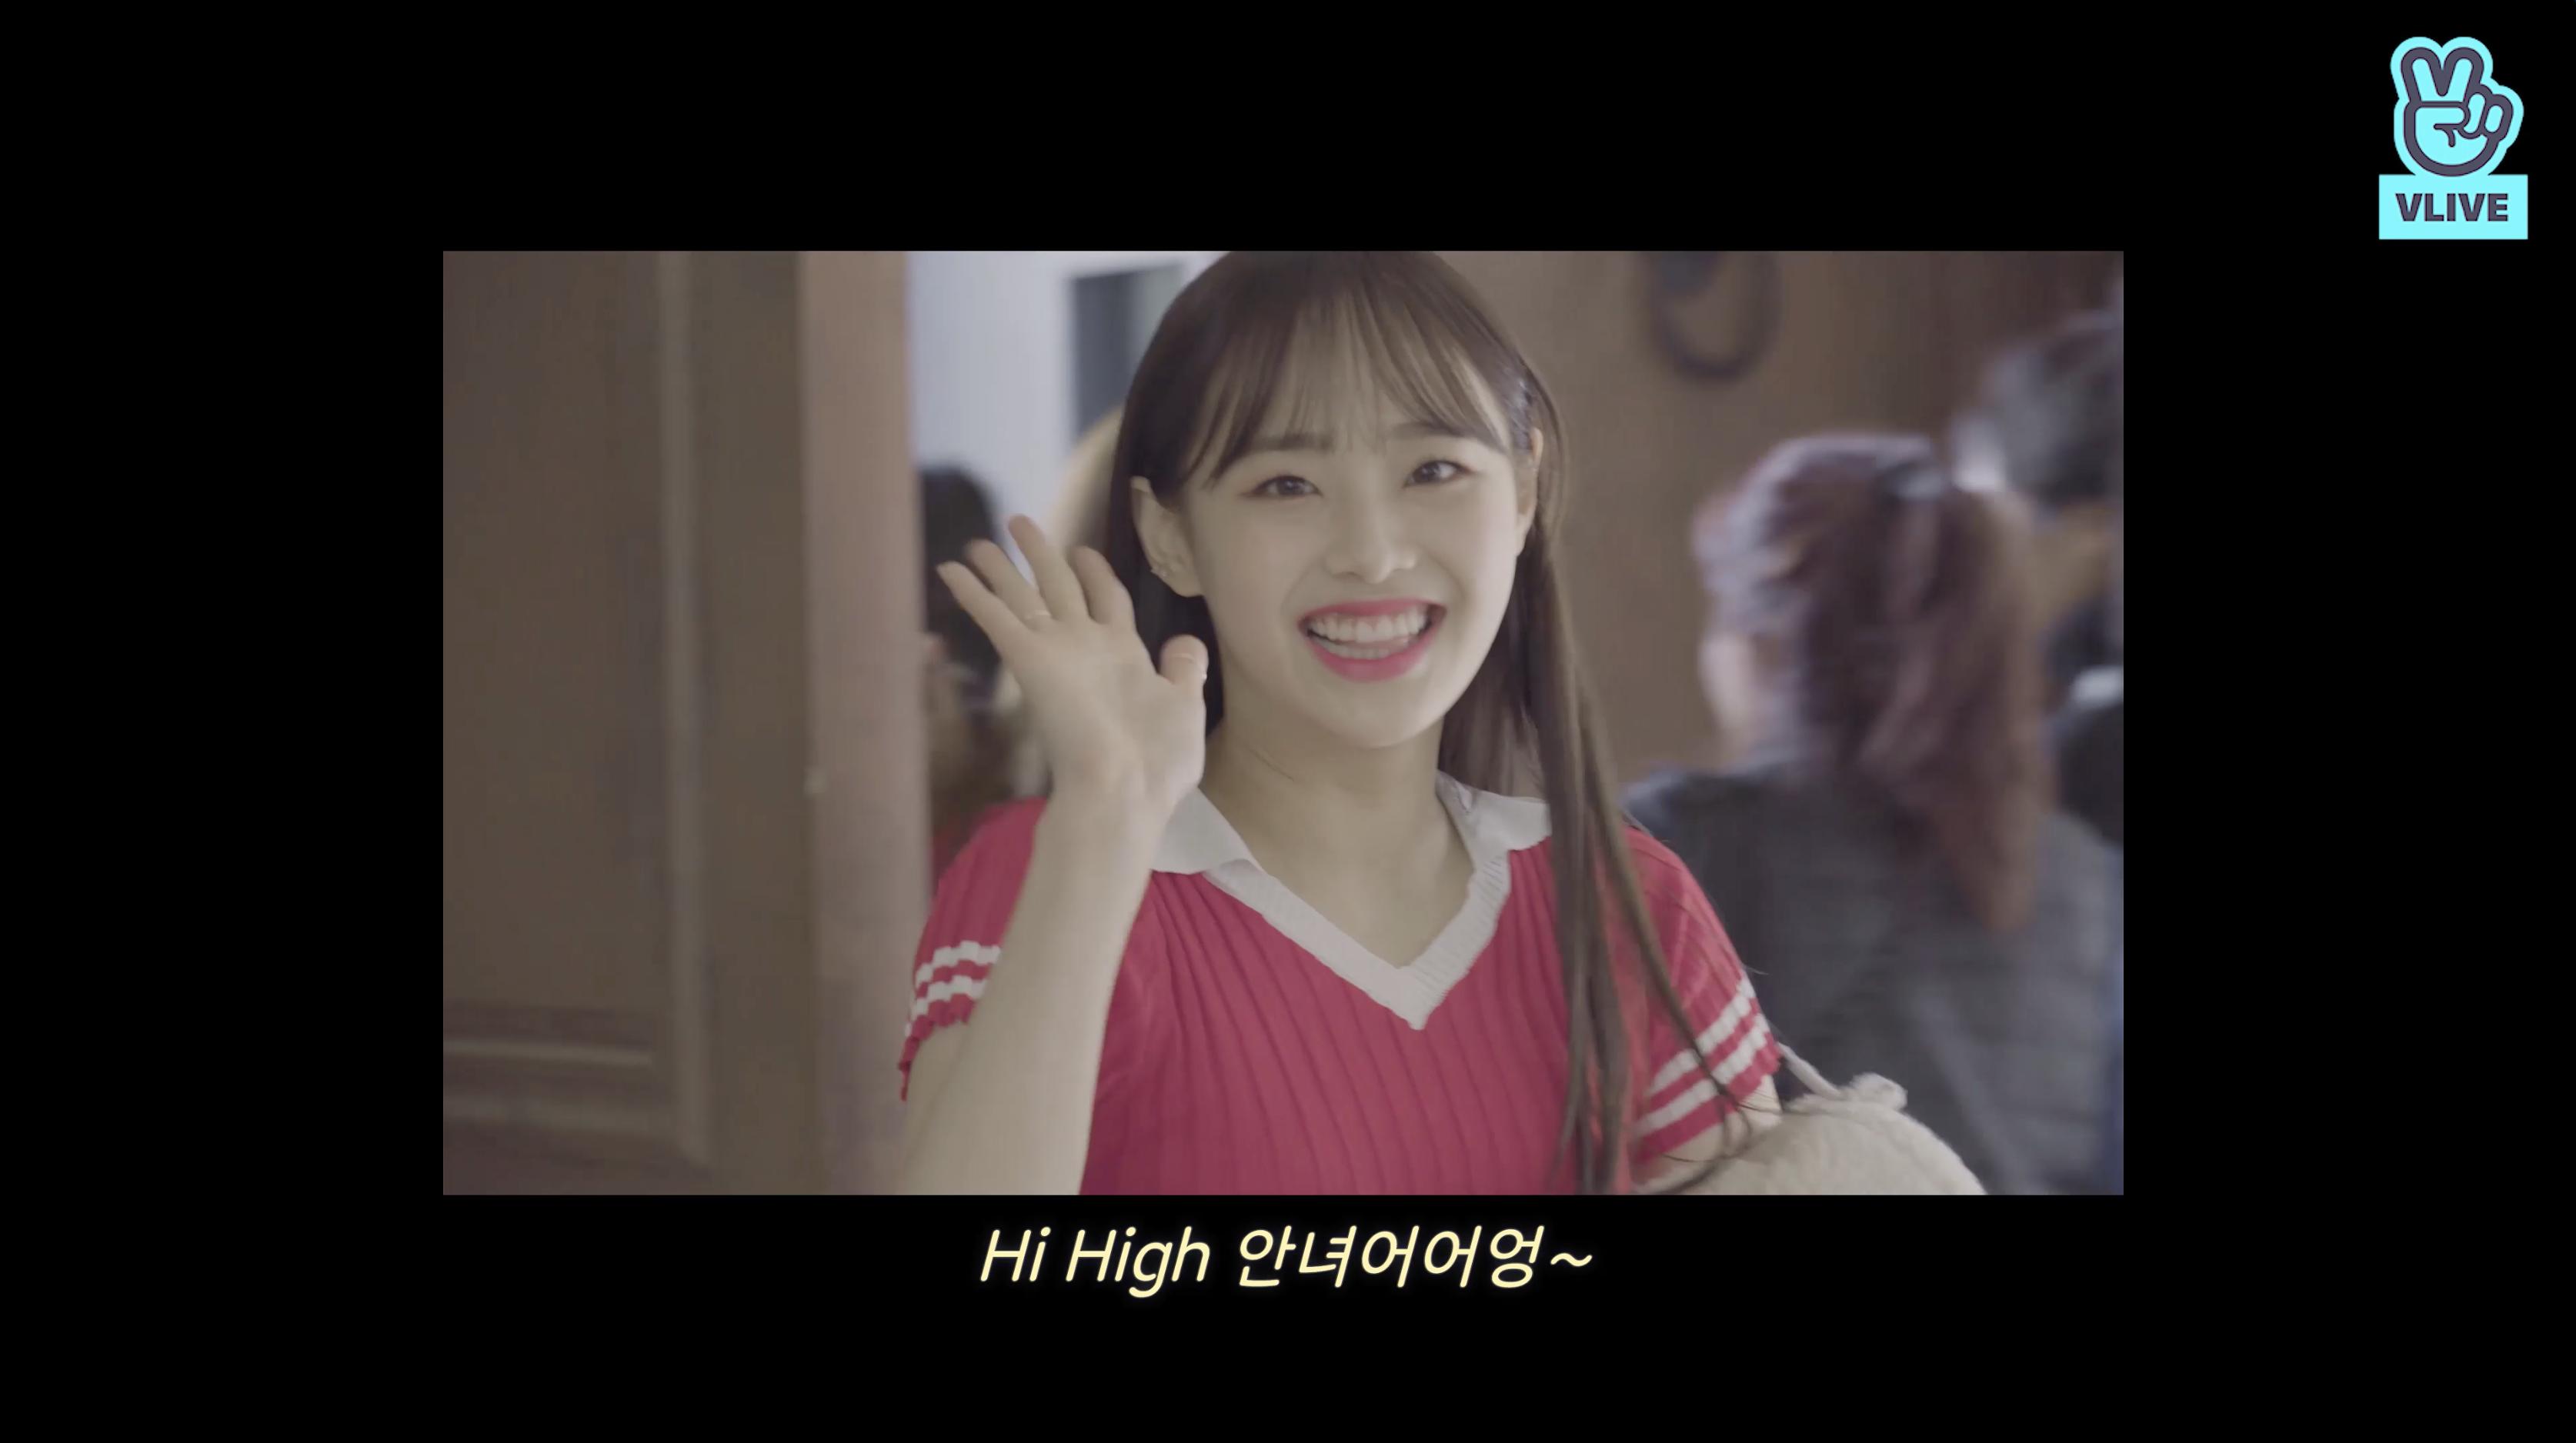 [MULTI/VERSE_BEHIND] 이달의 소녀(LOONA) 'Hi High'편 (👋🏼)